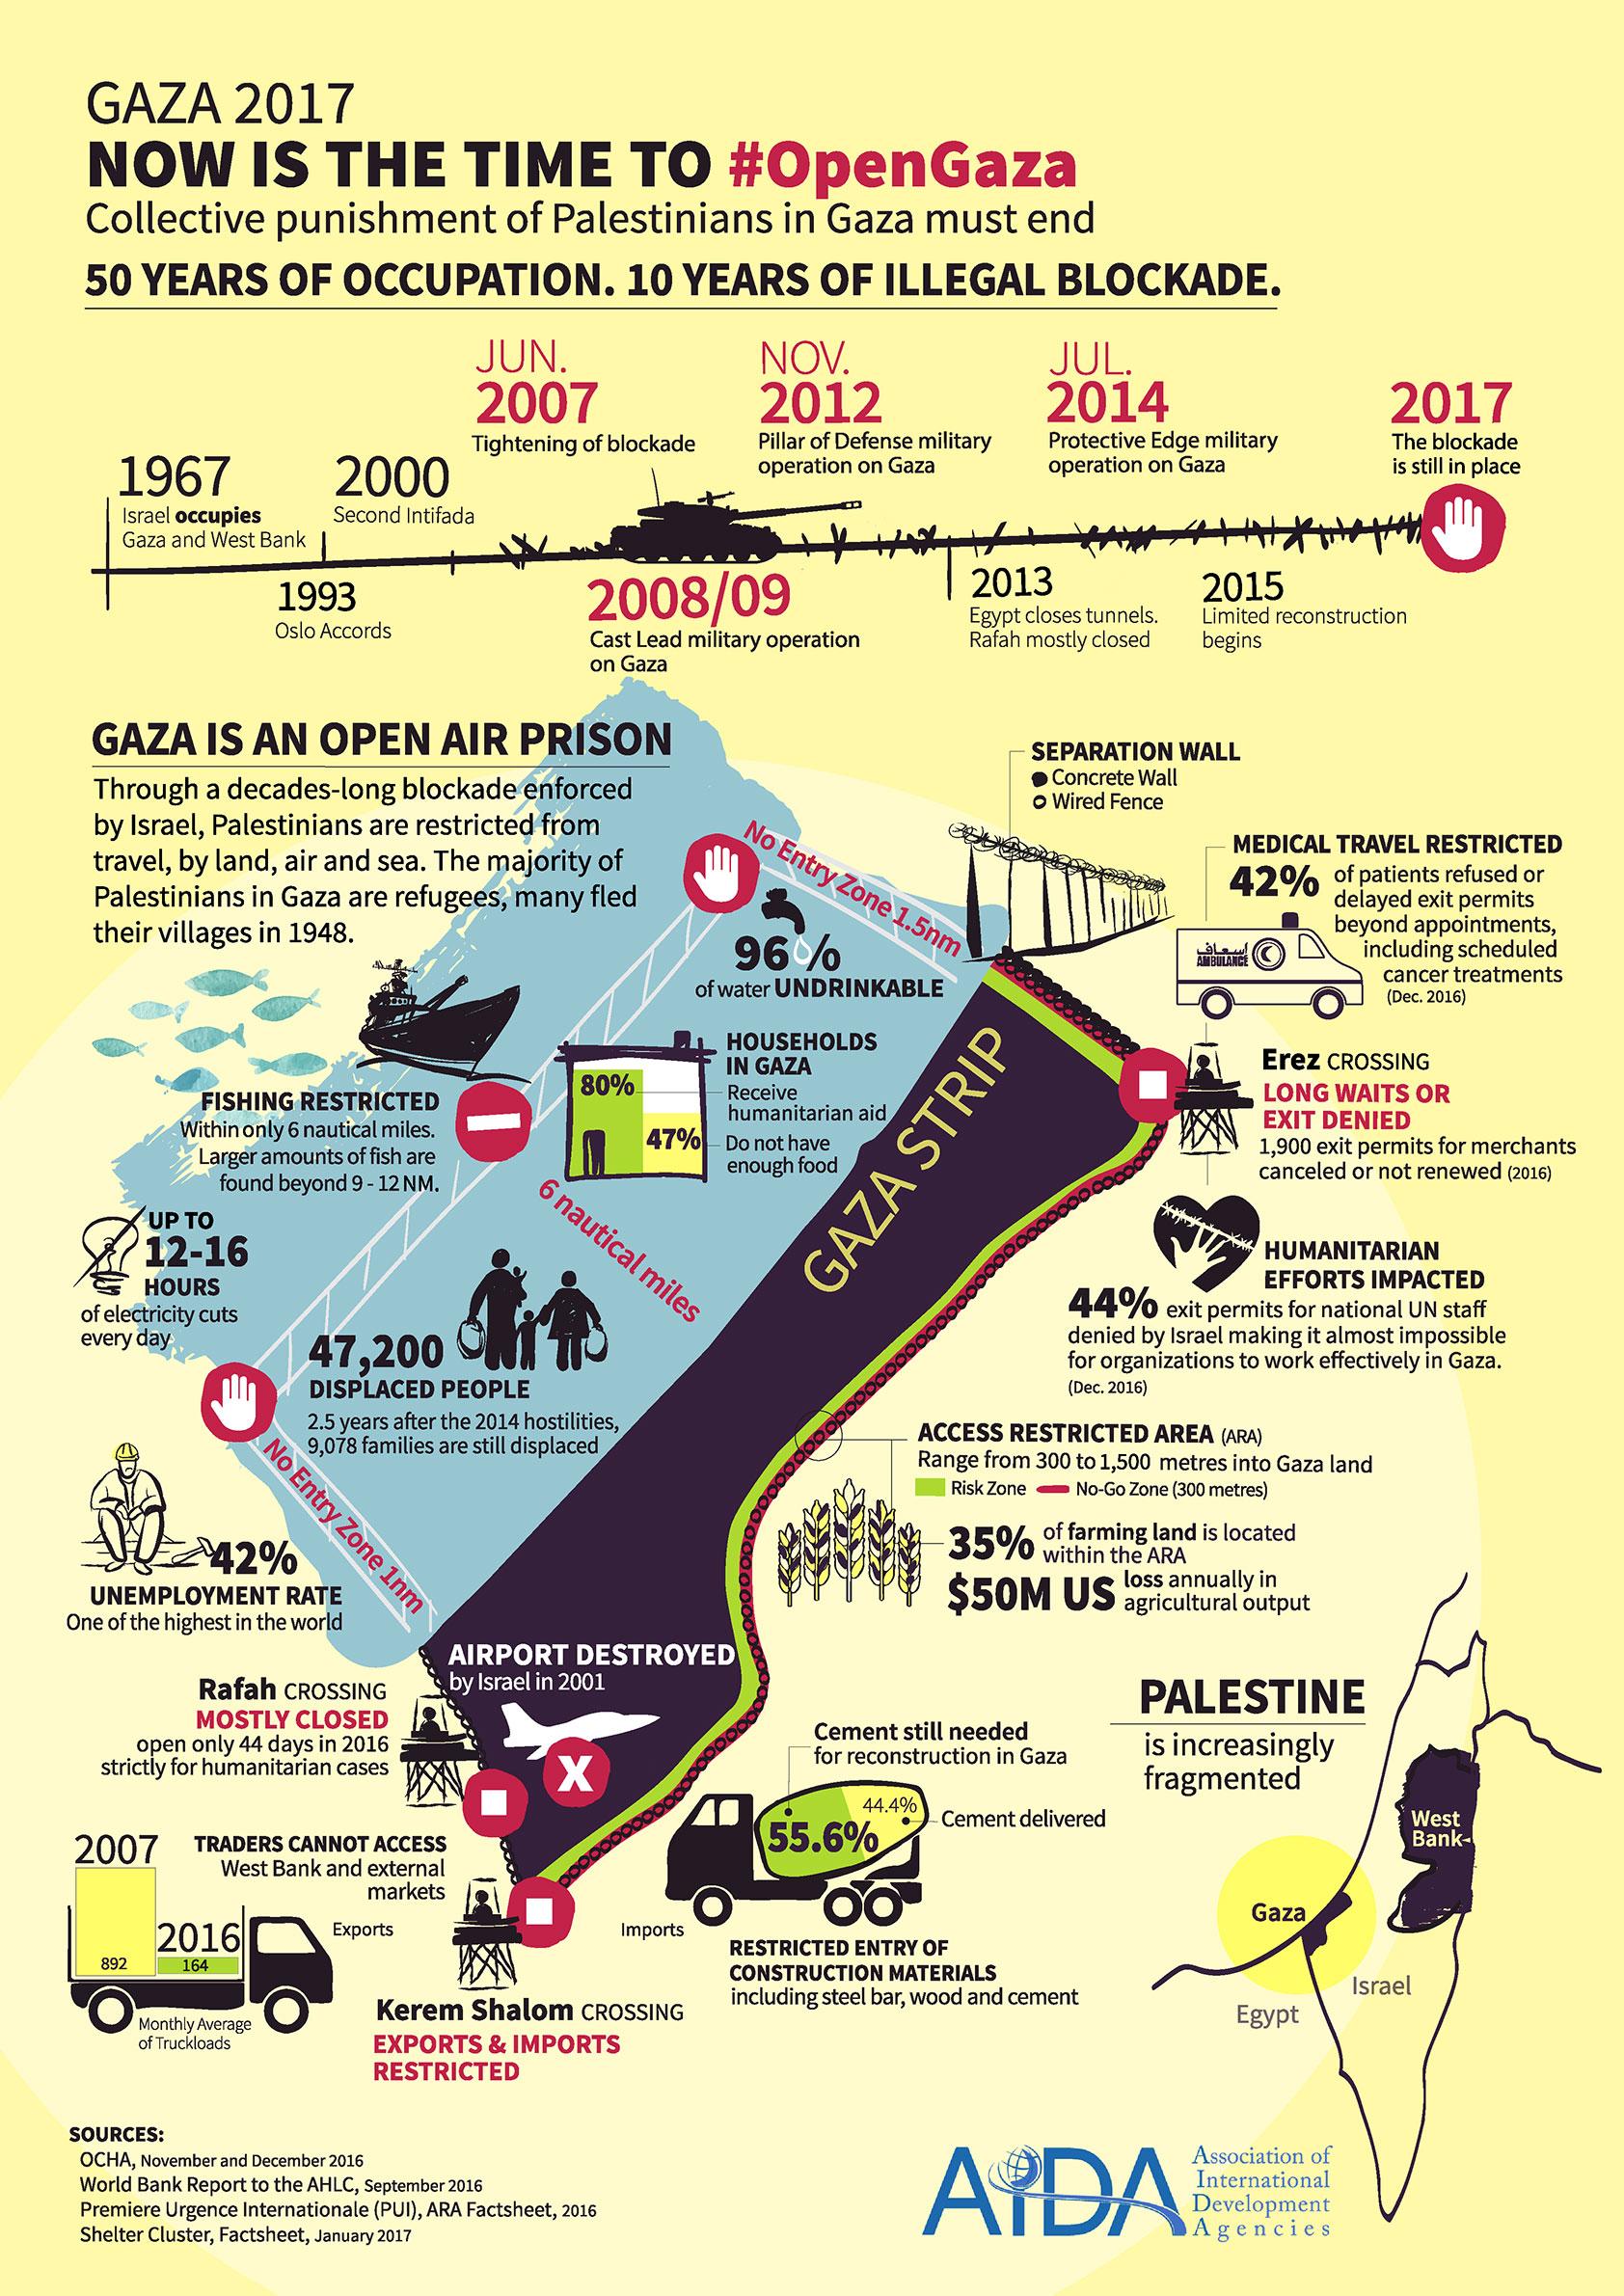 AIDA-infographic